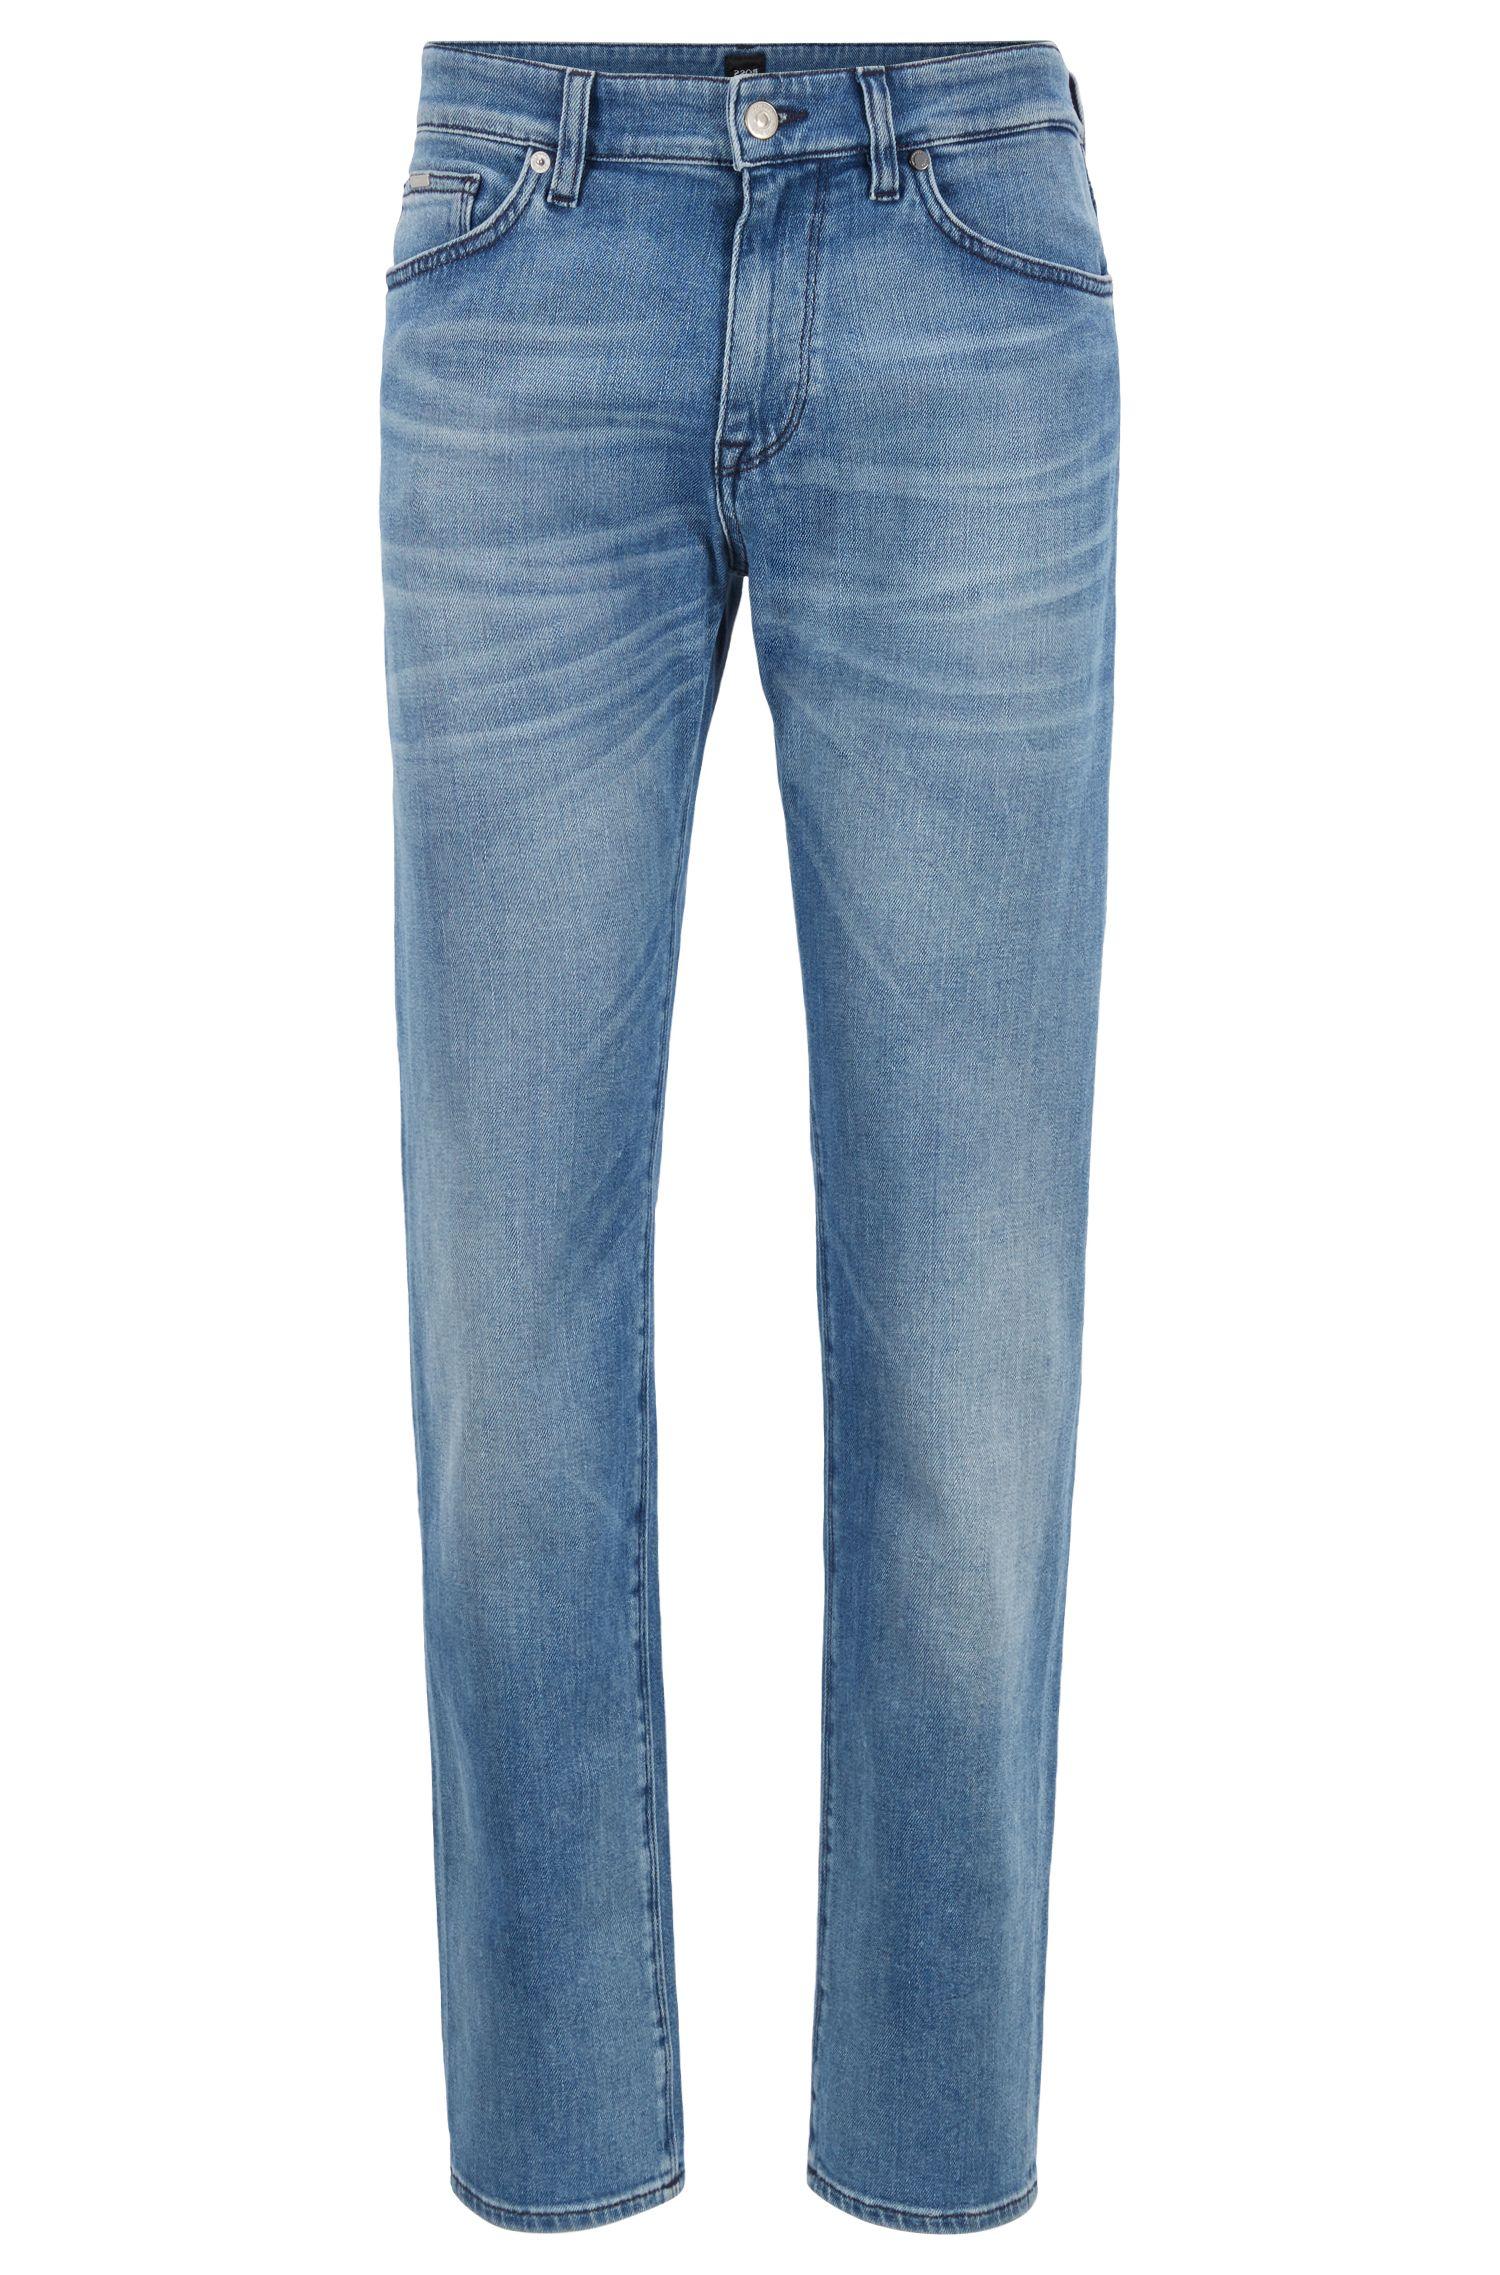 Regular-Fit Jeans aus BCI-Denim, Blau